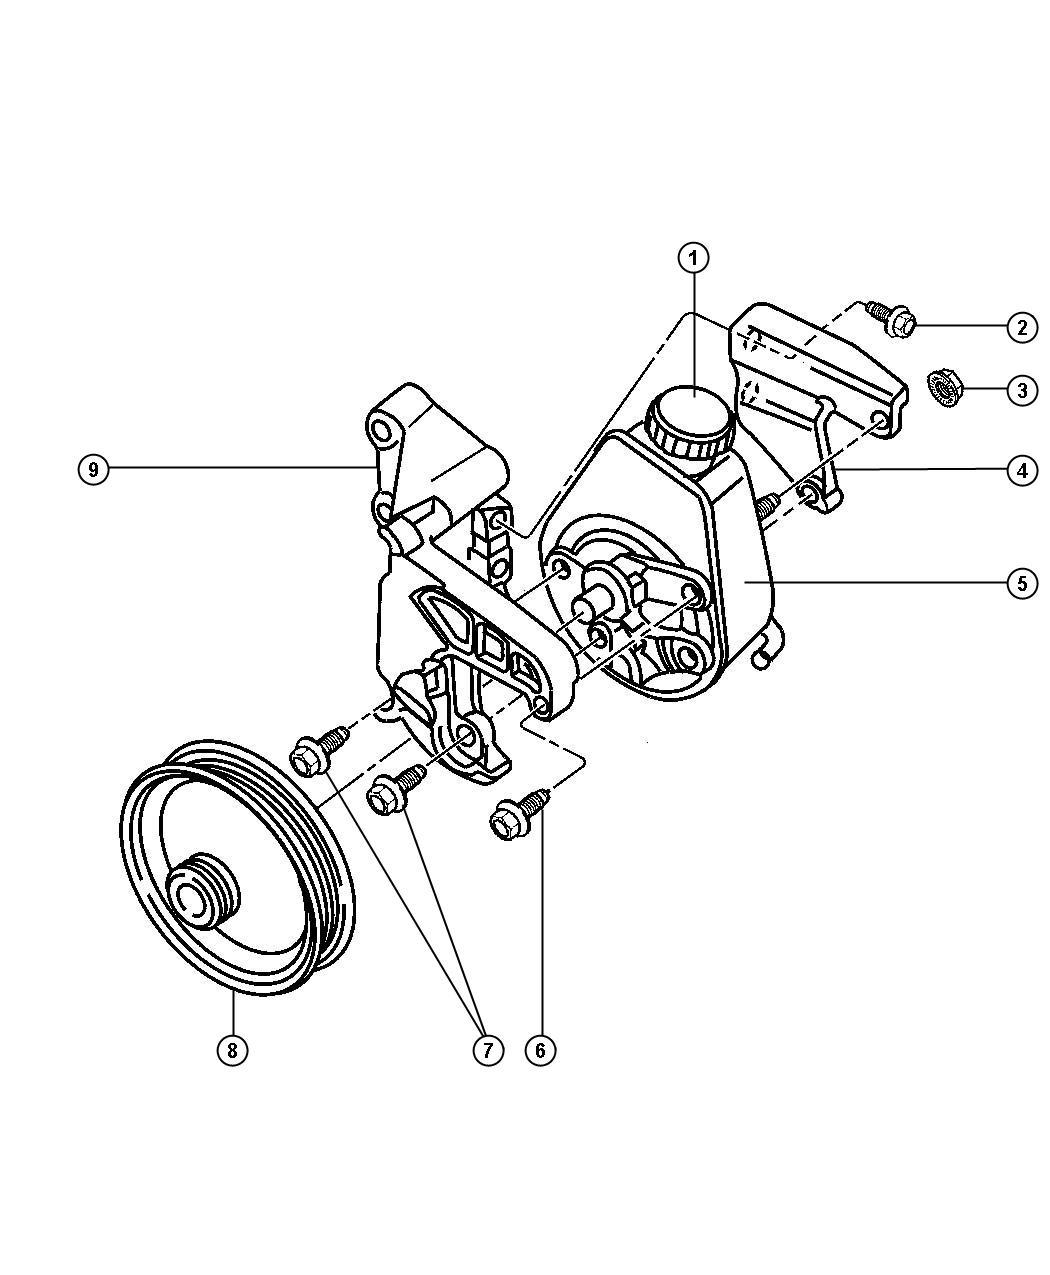 Dodge Ram 2500 Nut. Hex flange. M10x1.5. Mounting